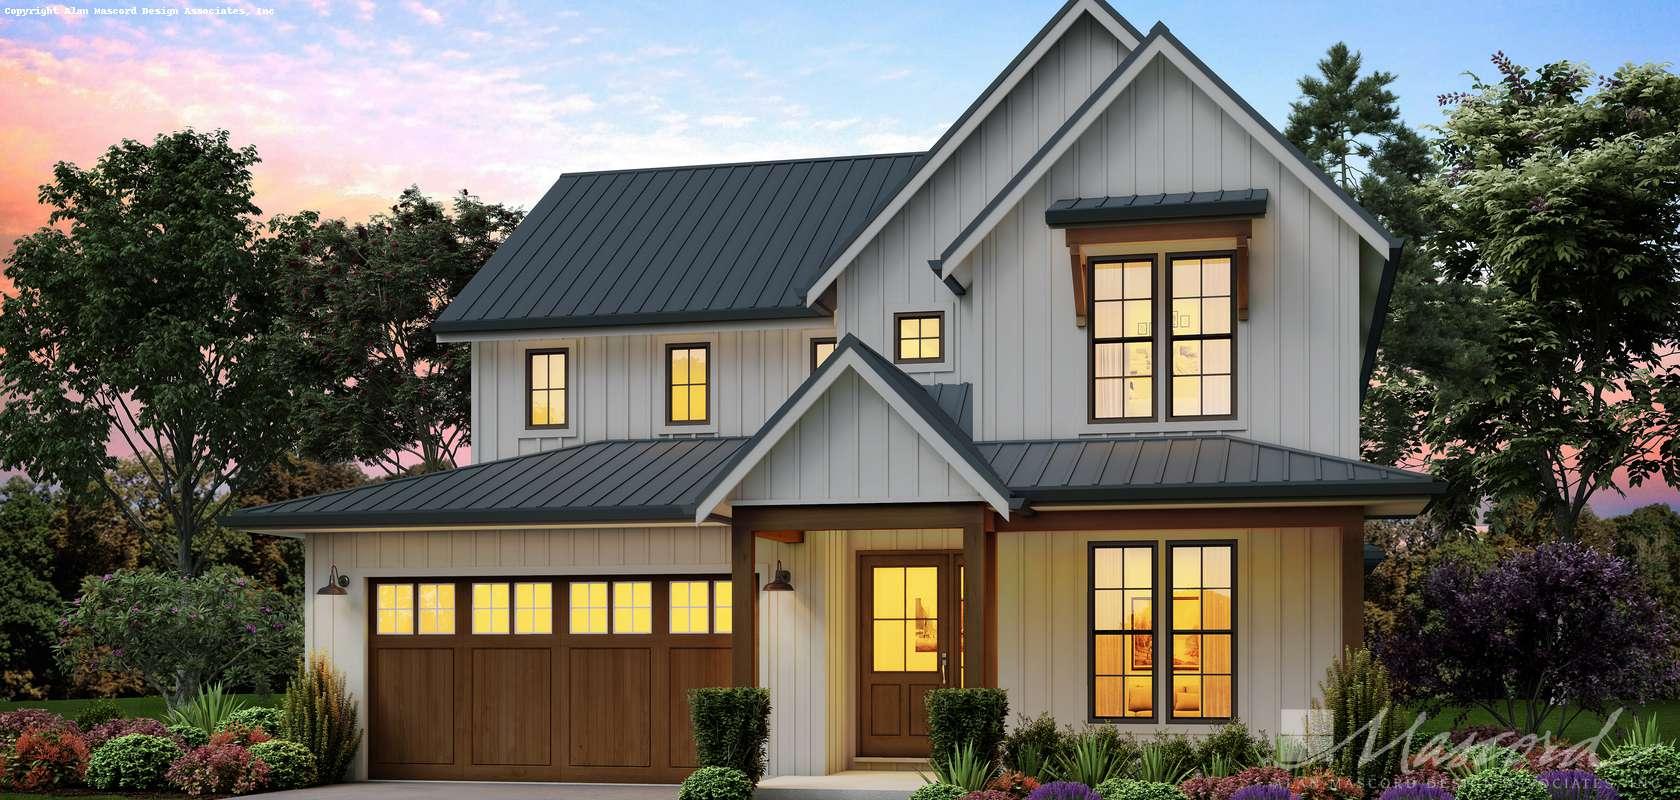 House Plans | Floor Plans | Custom Home Design Services